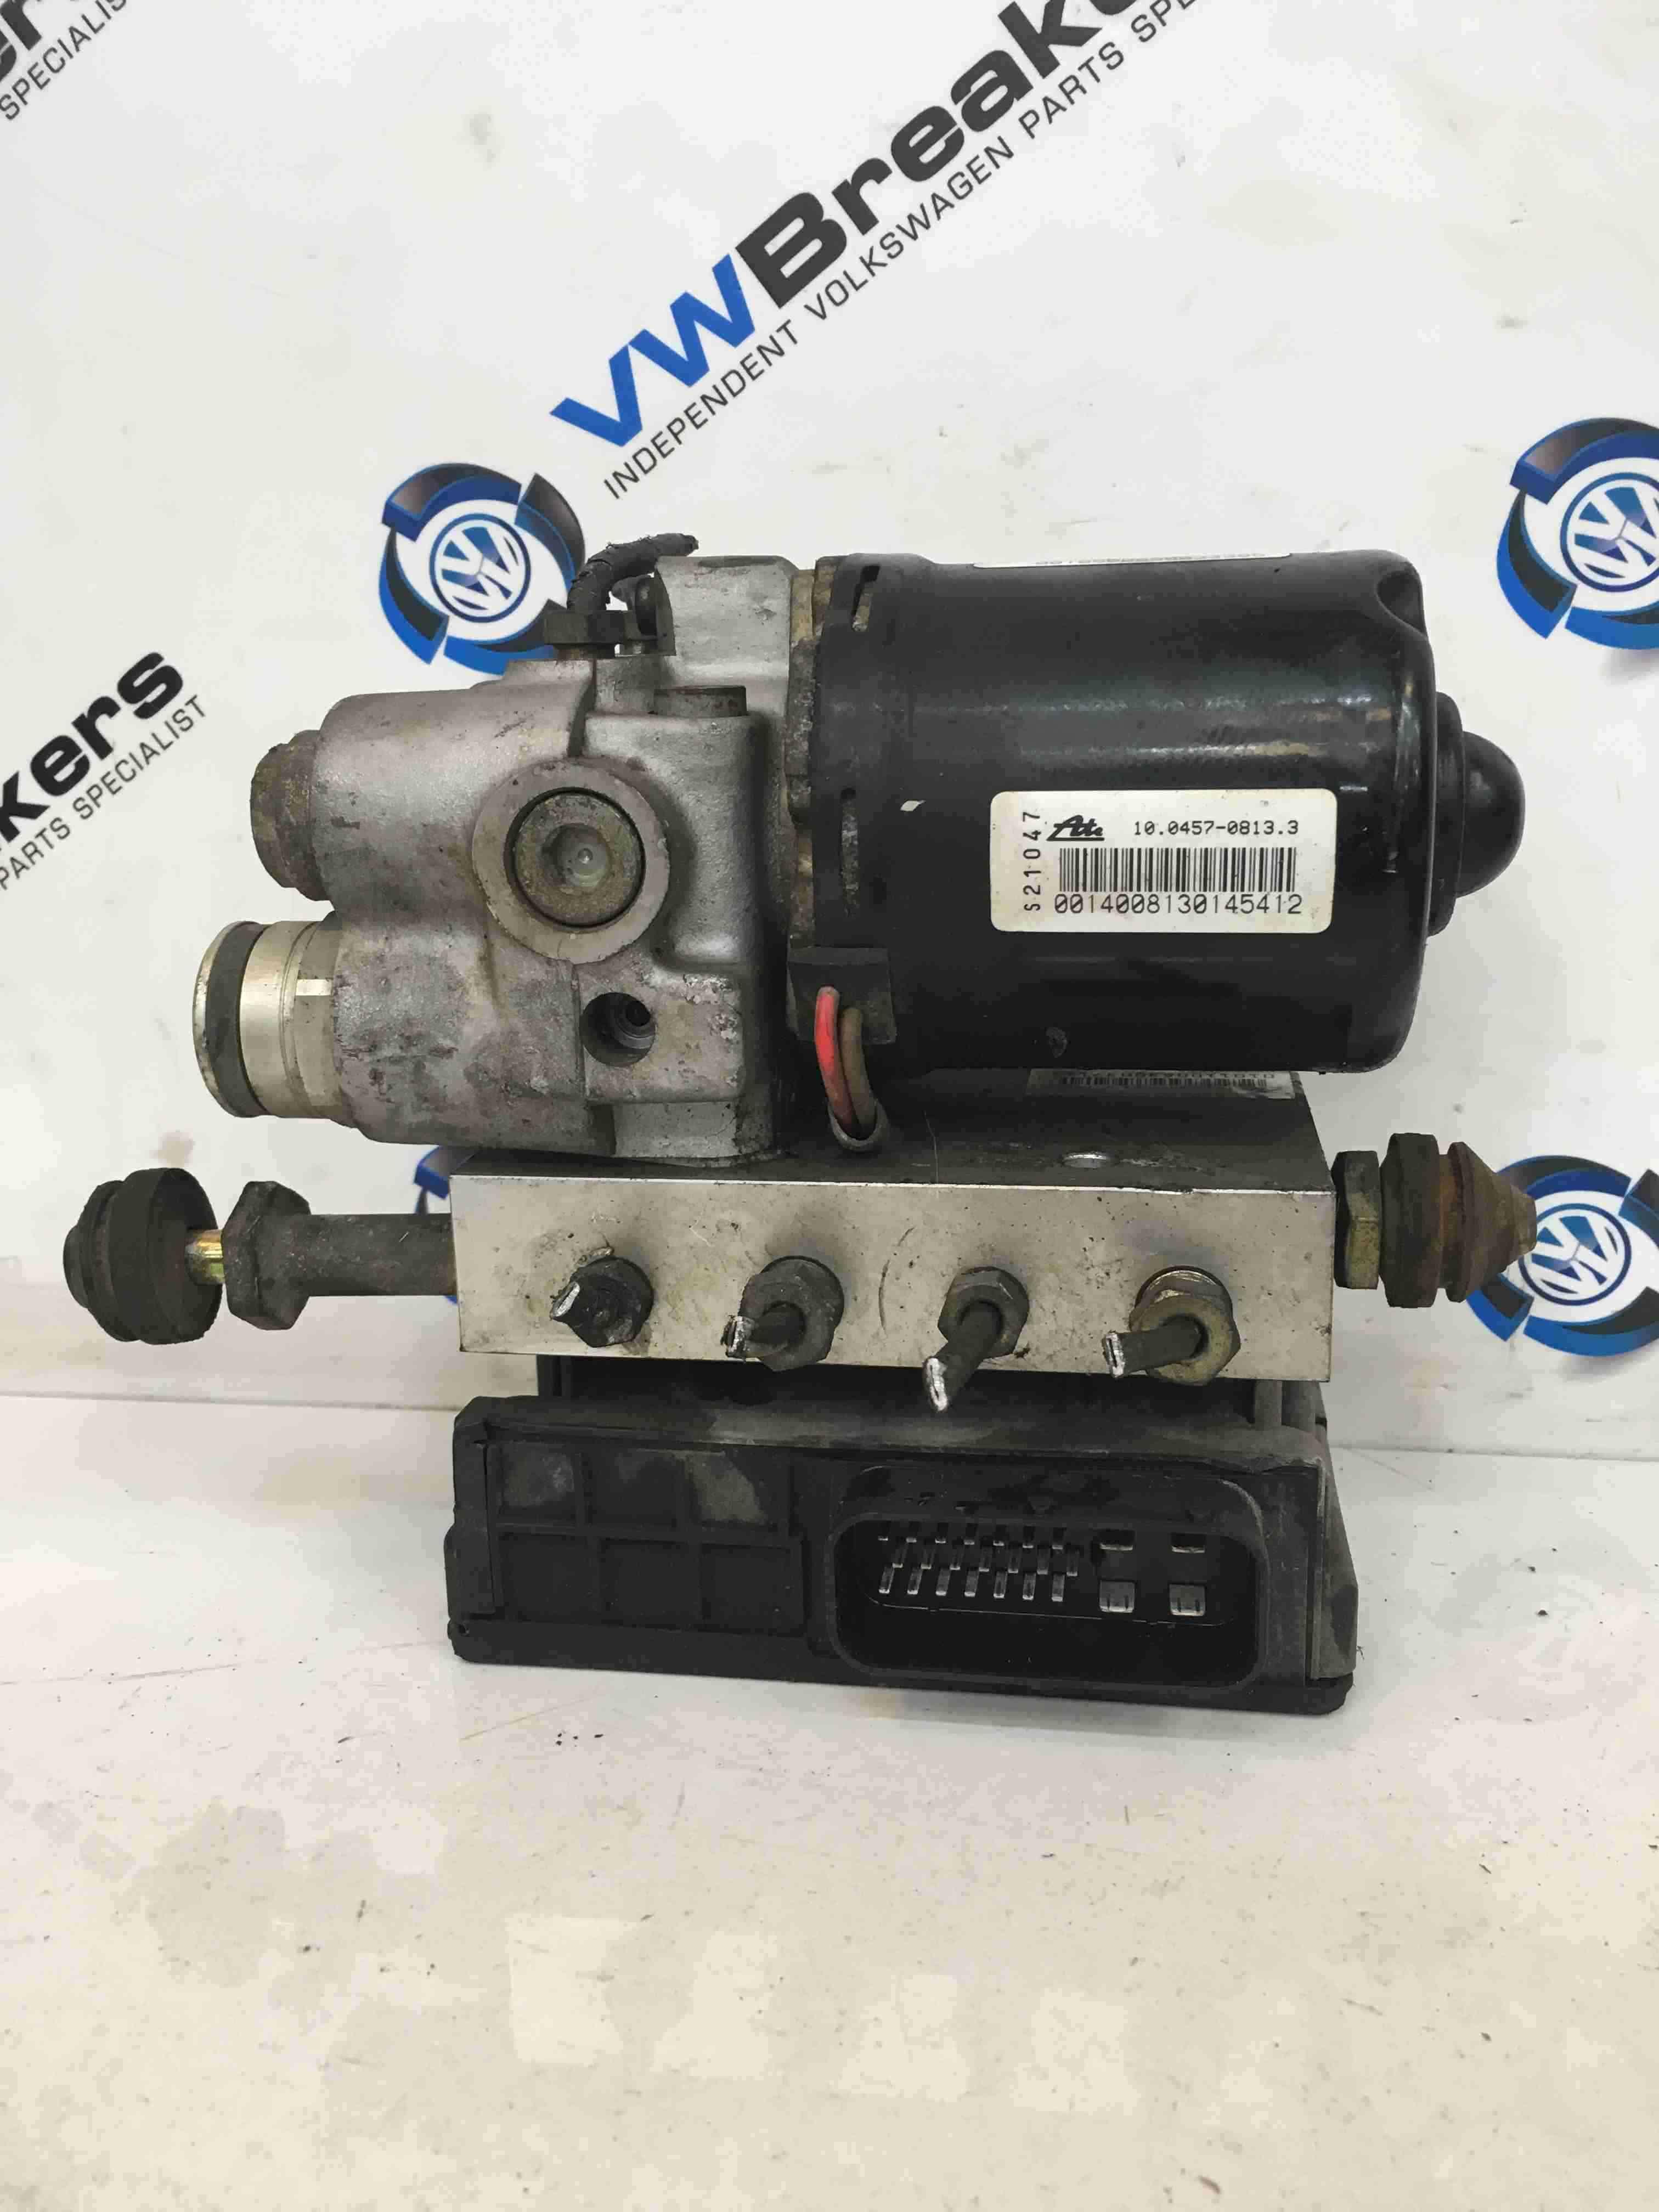 Volkswagen Sharan 1995-2003 ABS Pump Unit + Module 7M0614111K 7M0907379